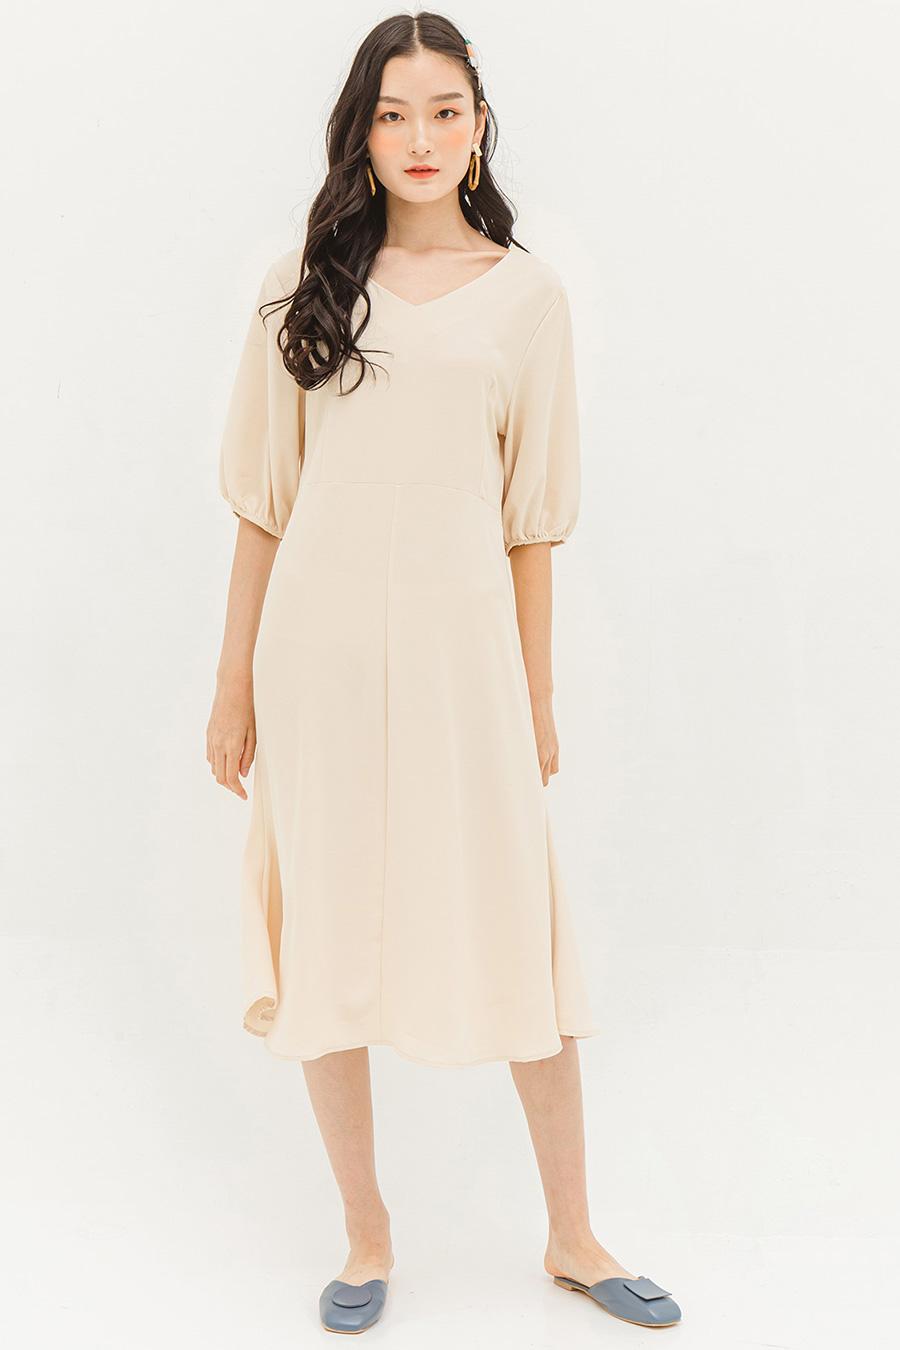 CLARICE DRESS - BISCOTTI